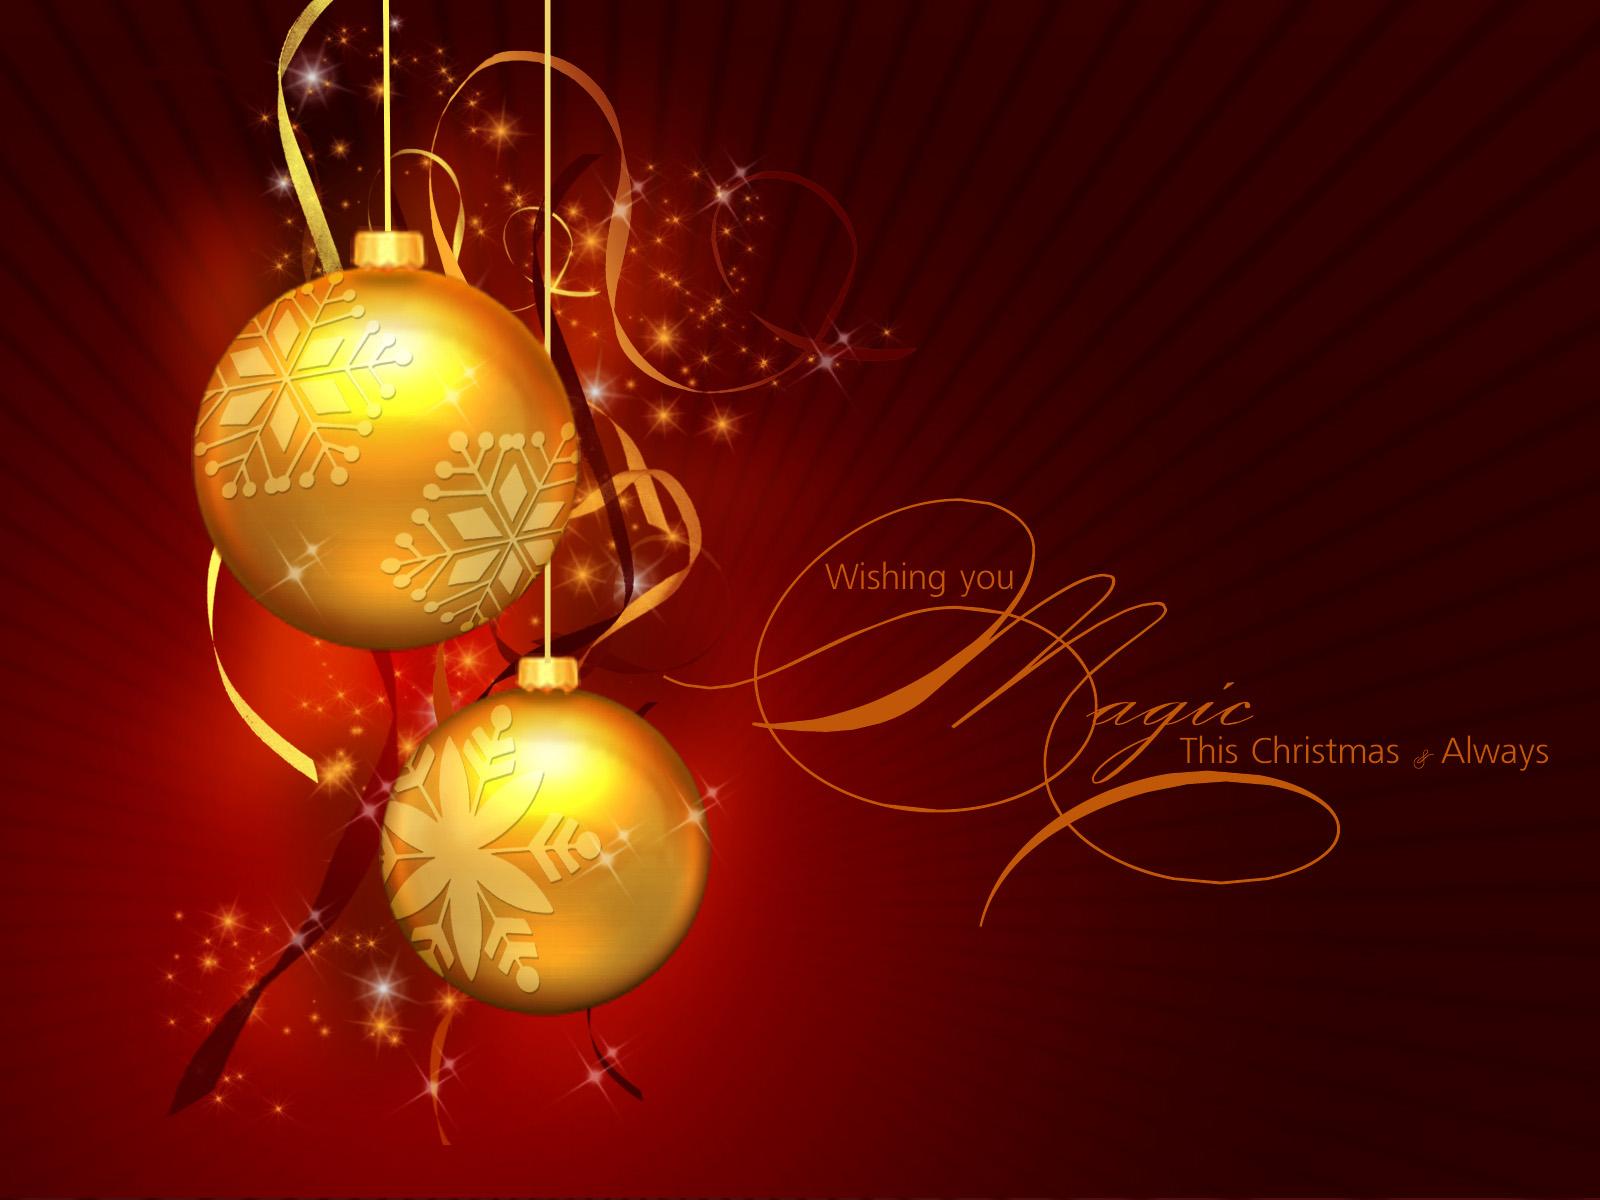 http://2.bp.blogspot.com/-_lupiMHGiaQ/UKPEP235vdI/AAAAAAAAFik/LLjKvm_WUXA/s1600/bible-Christmas-blessings-2102.jpg